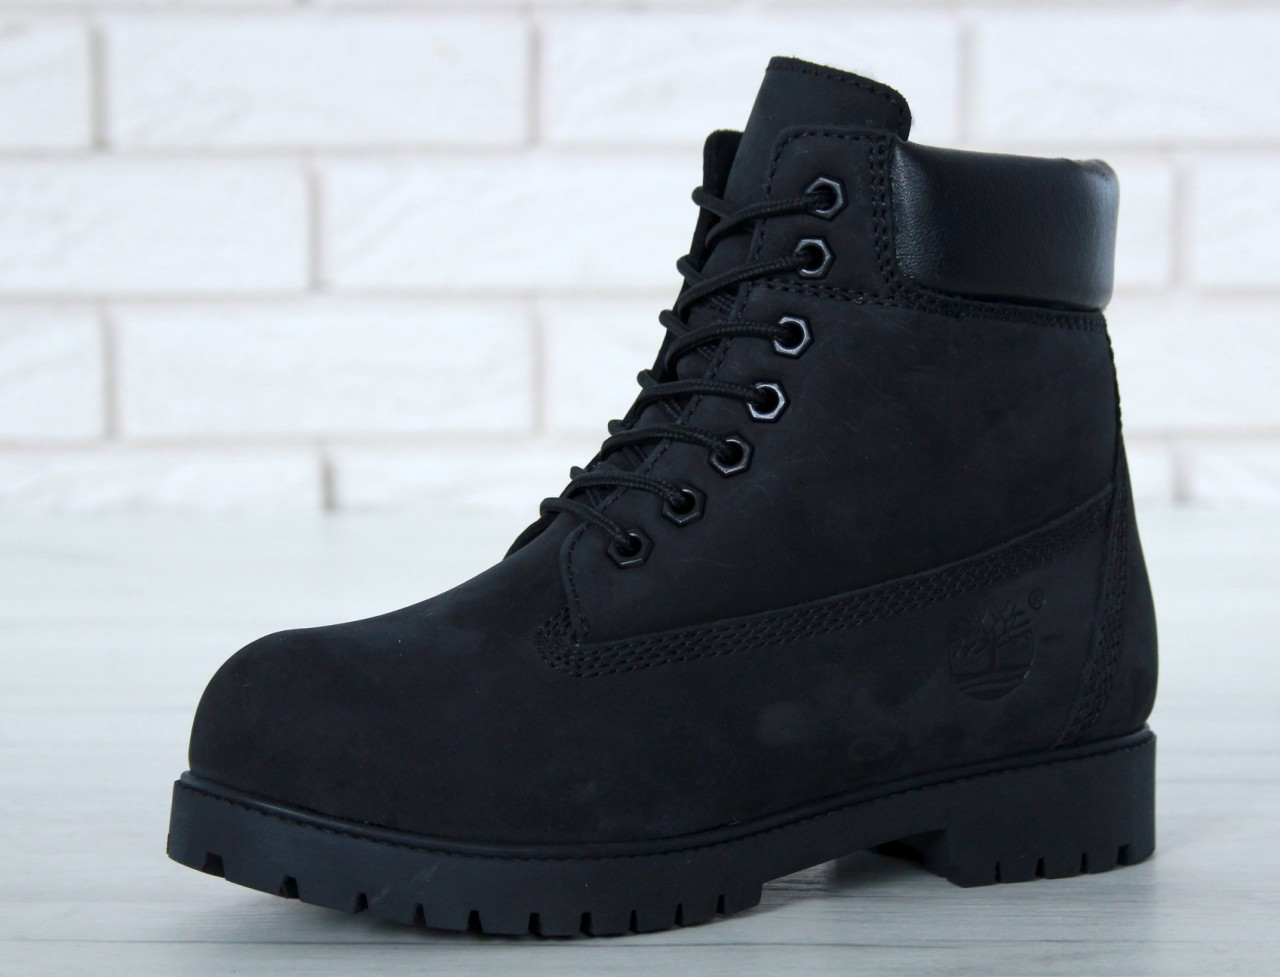 4a05dd247a4e Женские зимние ботинки Timberland, Черные, Натуральный нубук, Натуральная  шерсть